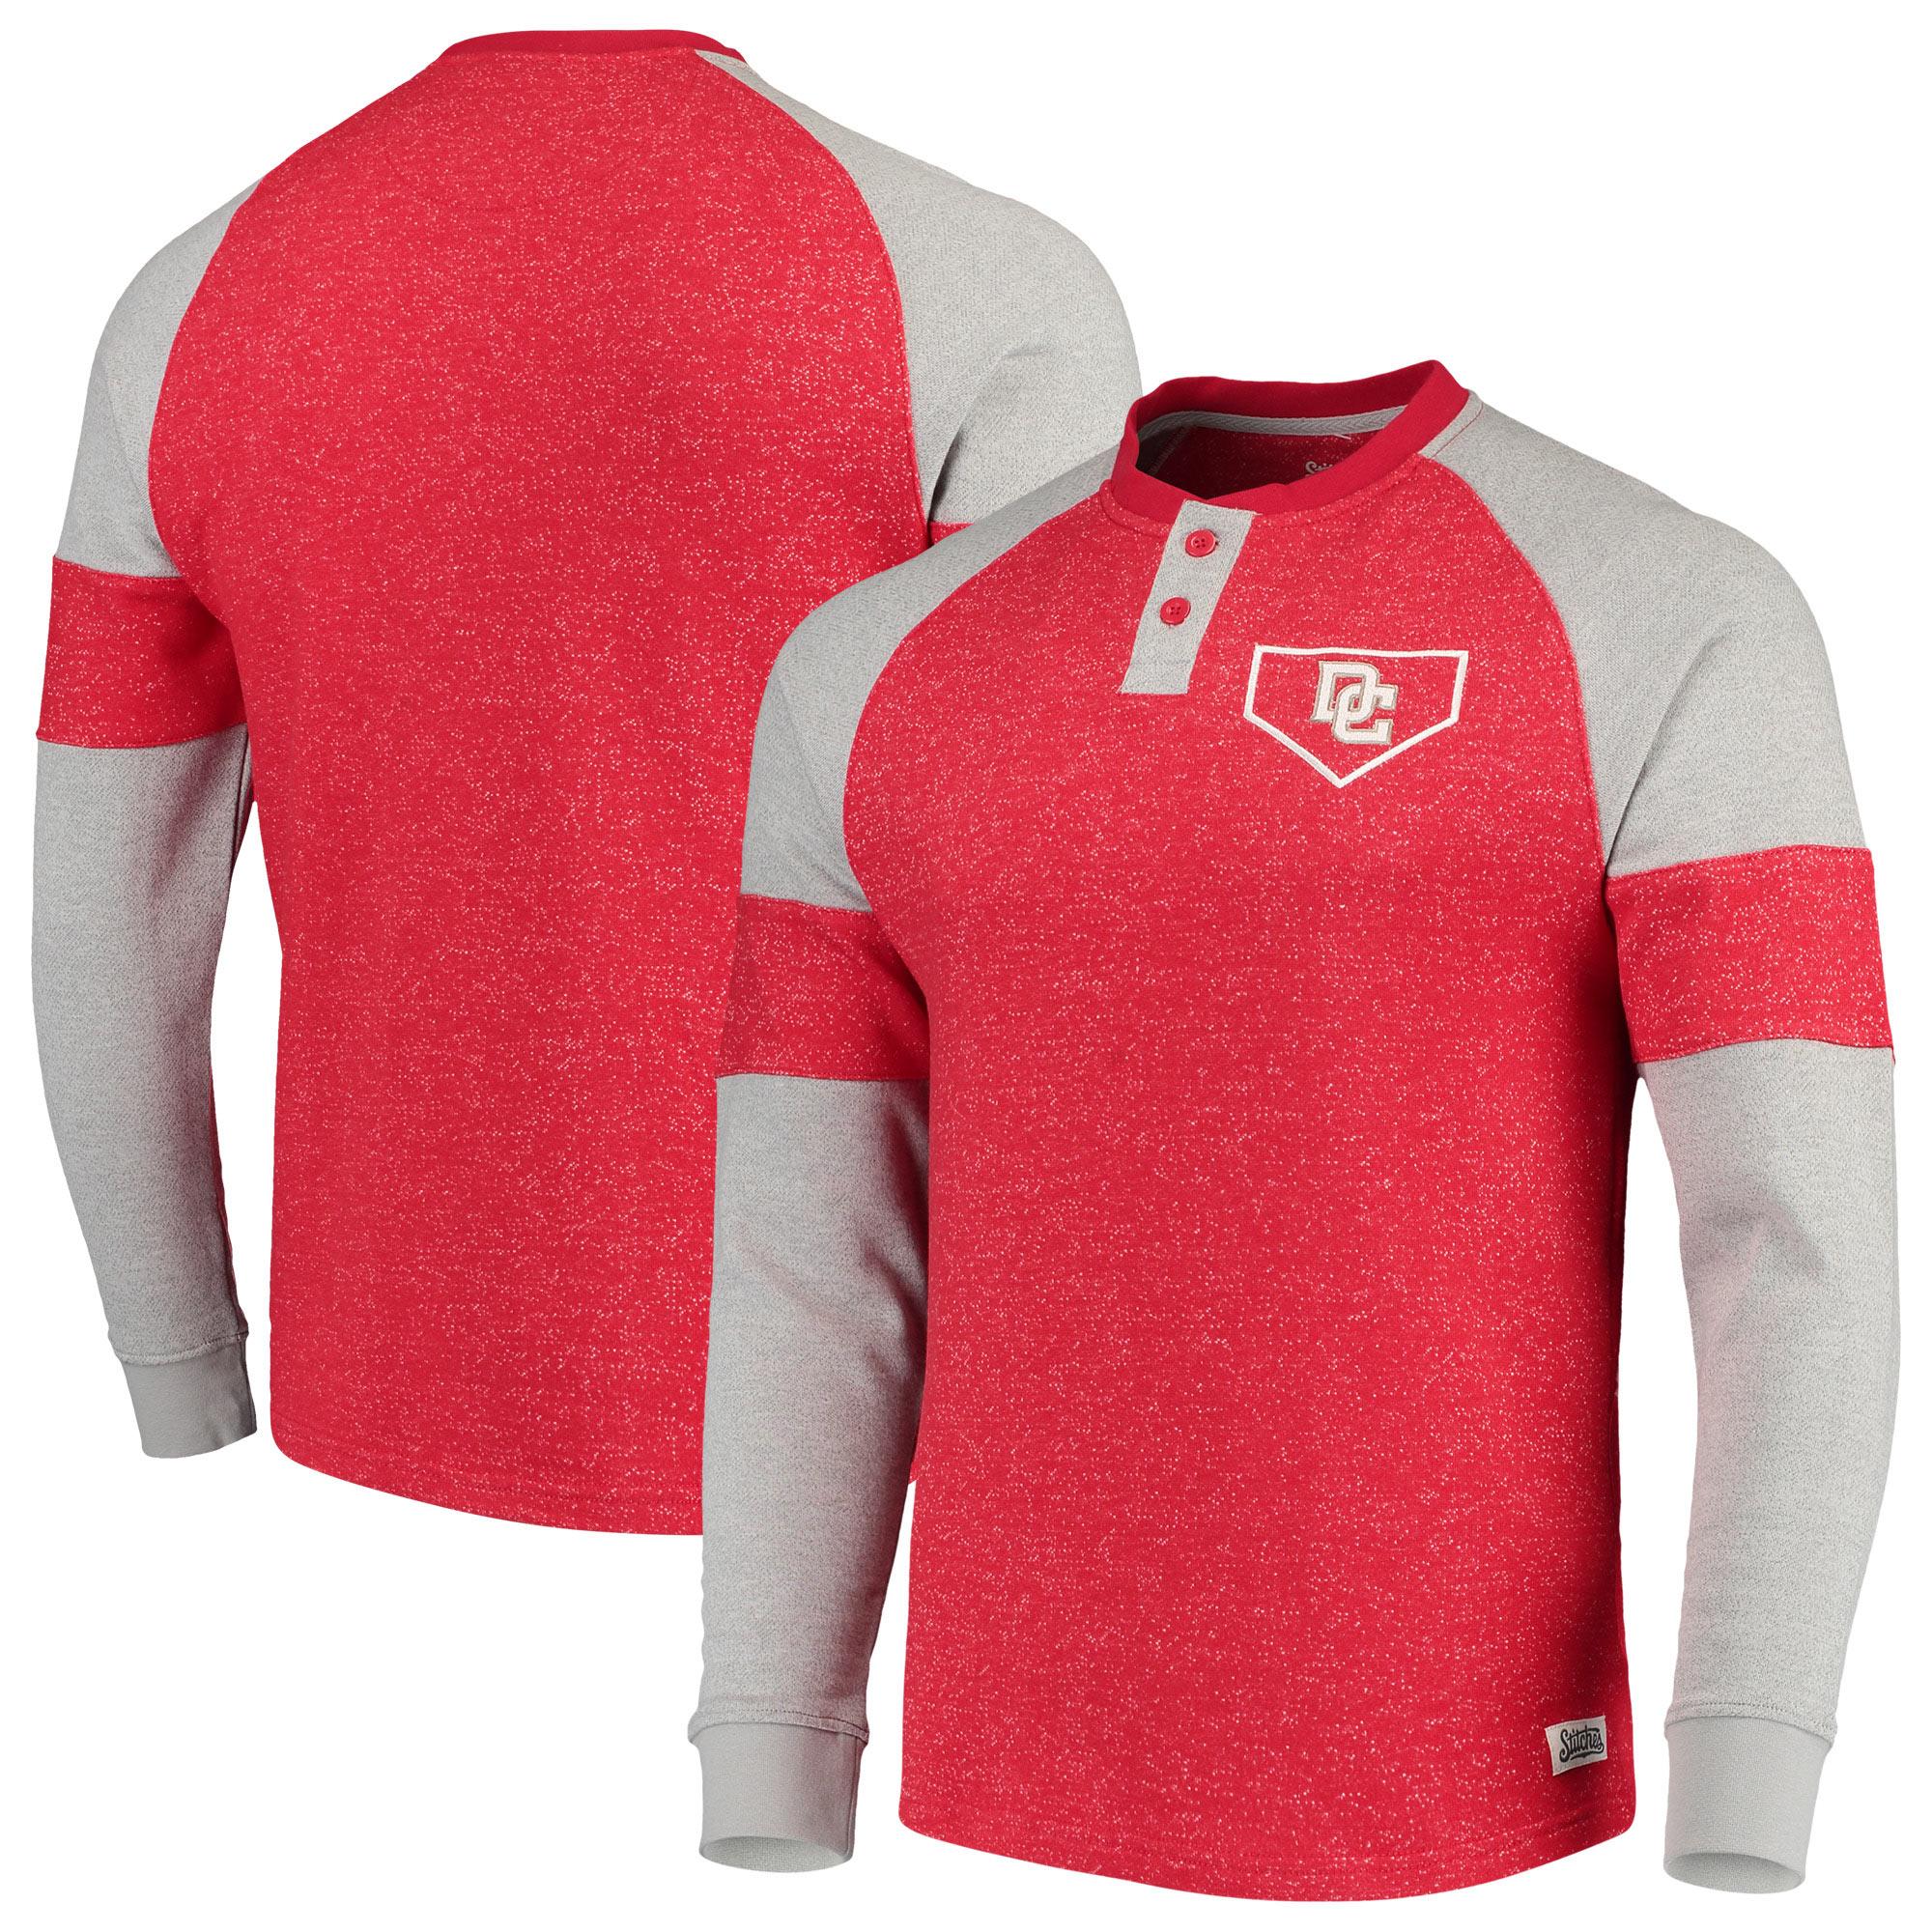 Washington Nationals Stitches Twisted Yarn Henley Long Sleeve T-Shirt - Red